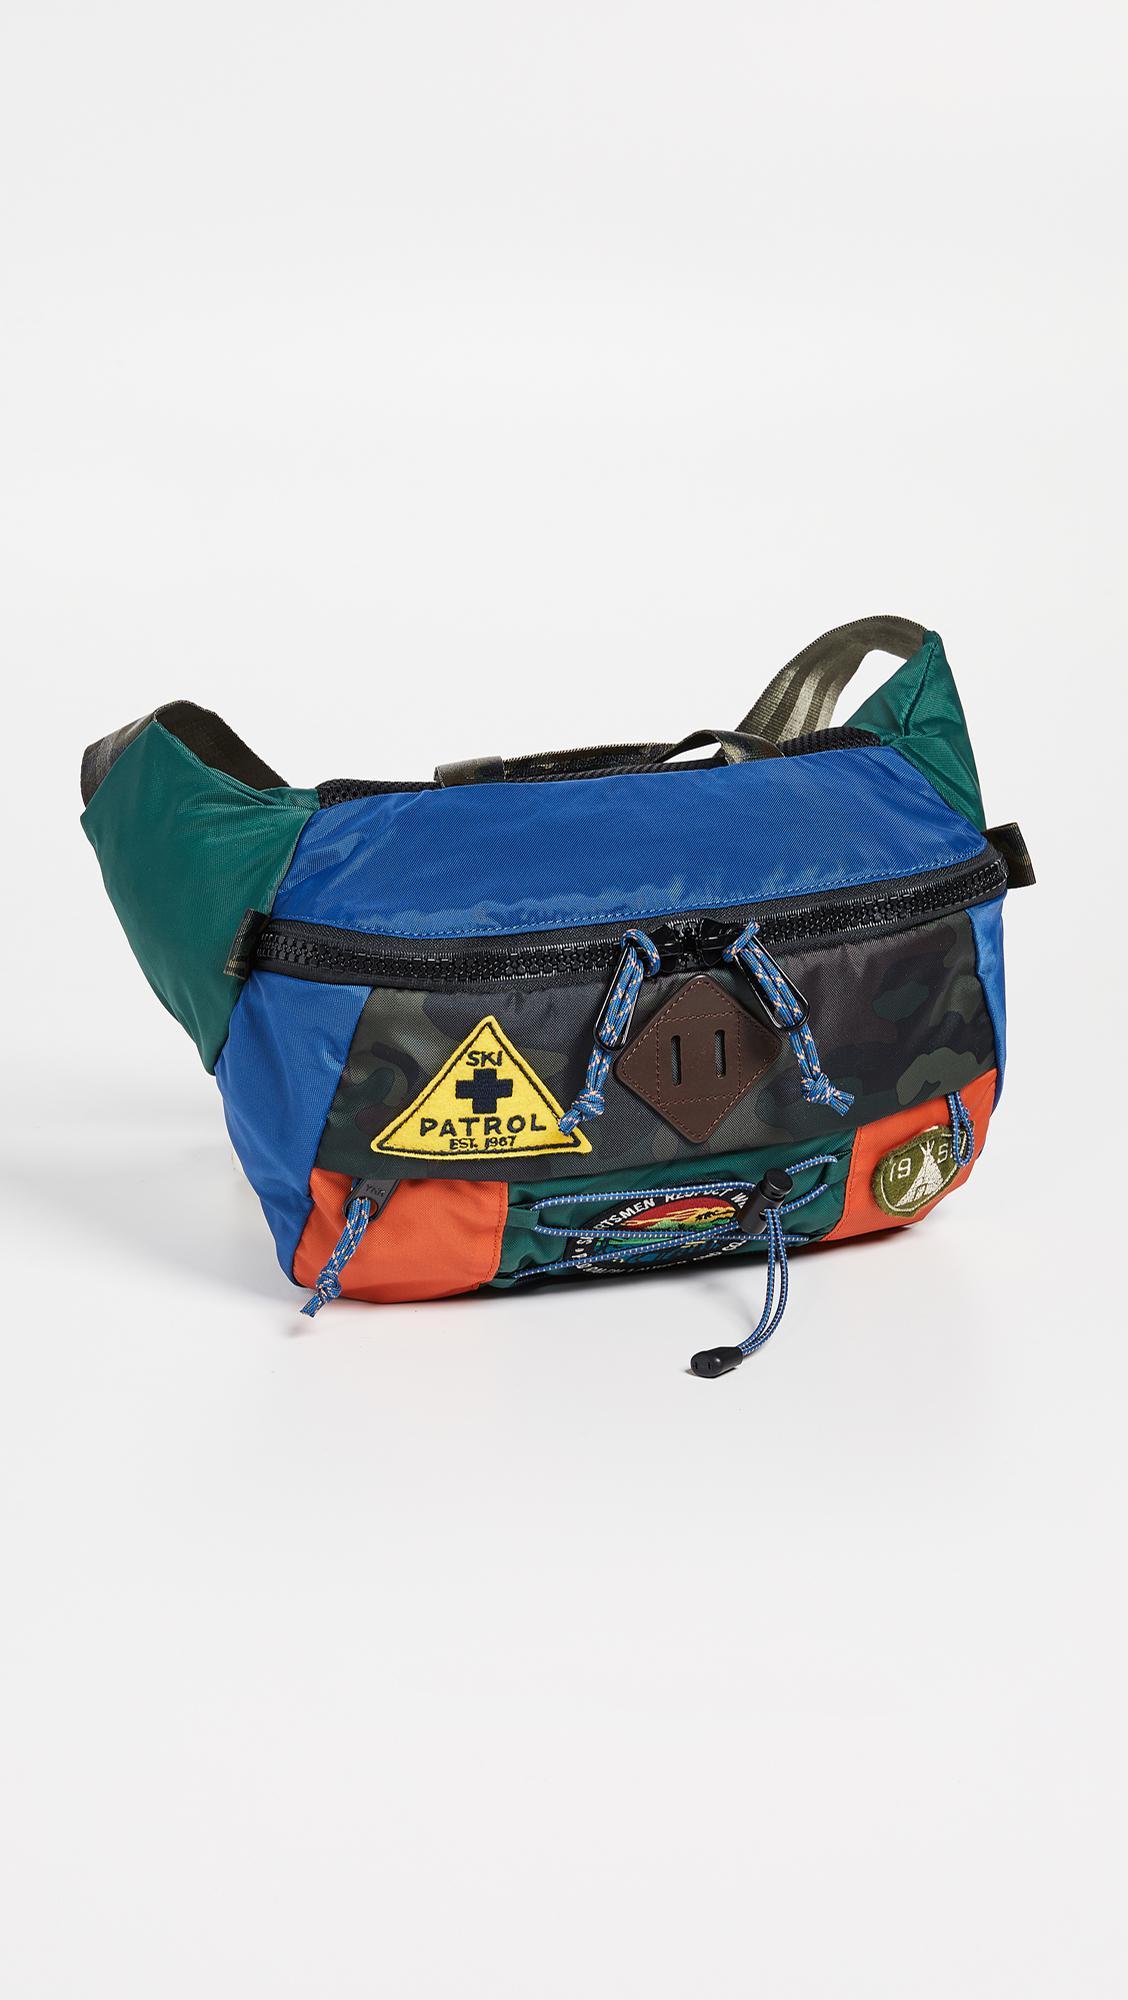 6339c6d98aab Polo Ralph Lauren Great Outdoors Waistpack in Blue for Men - Lyst